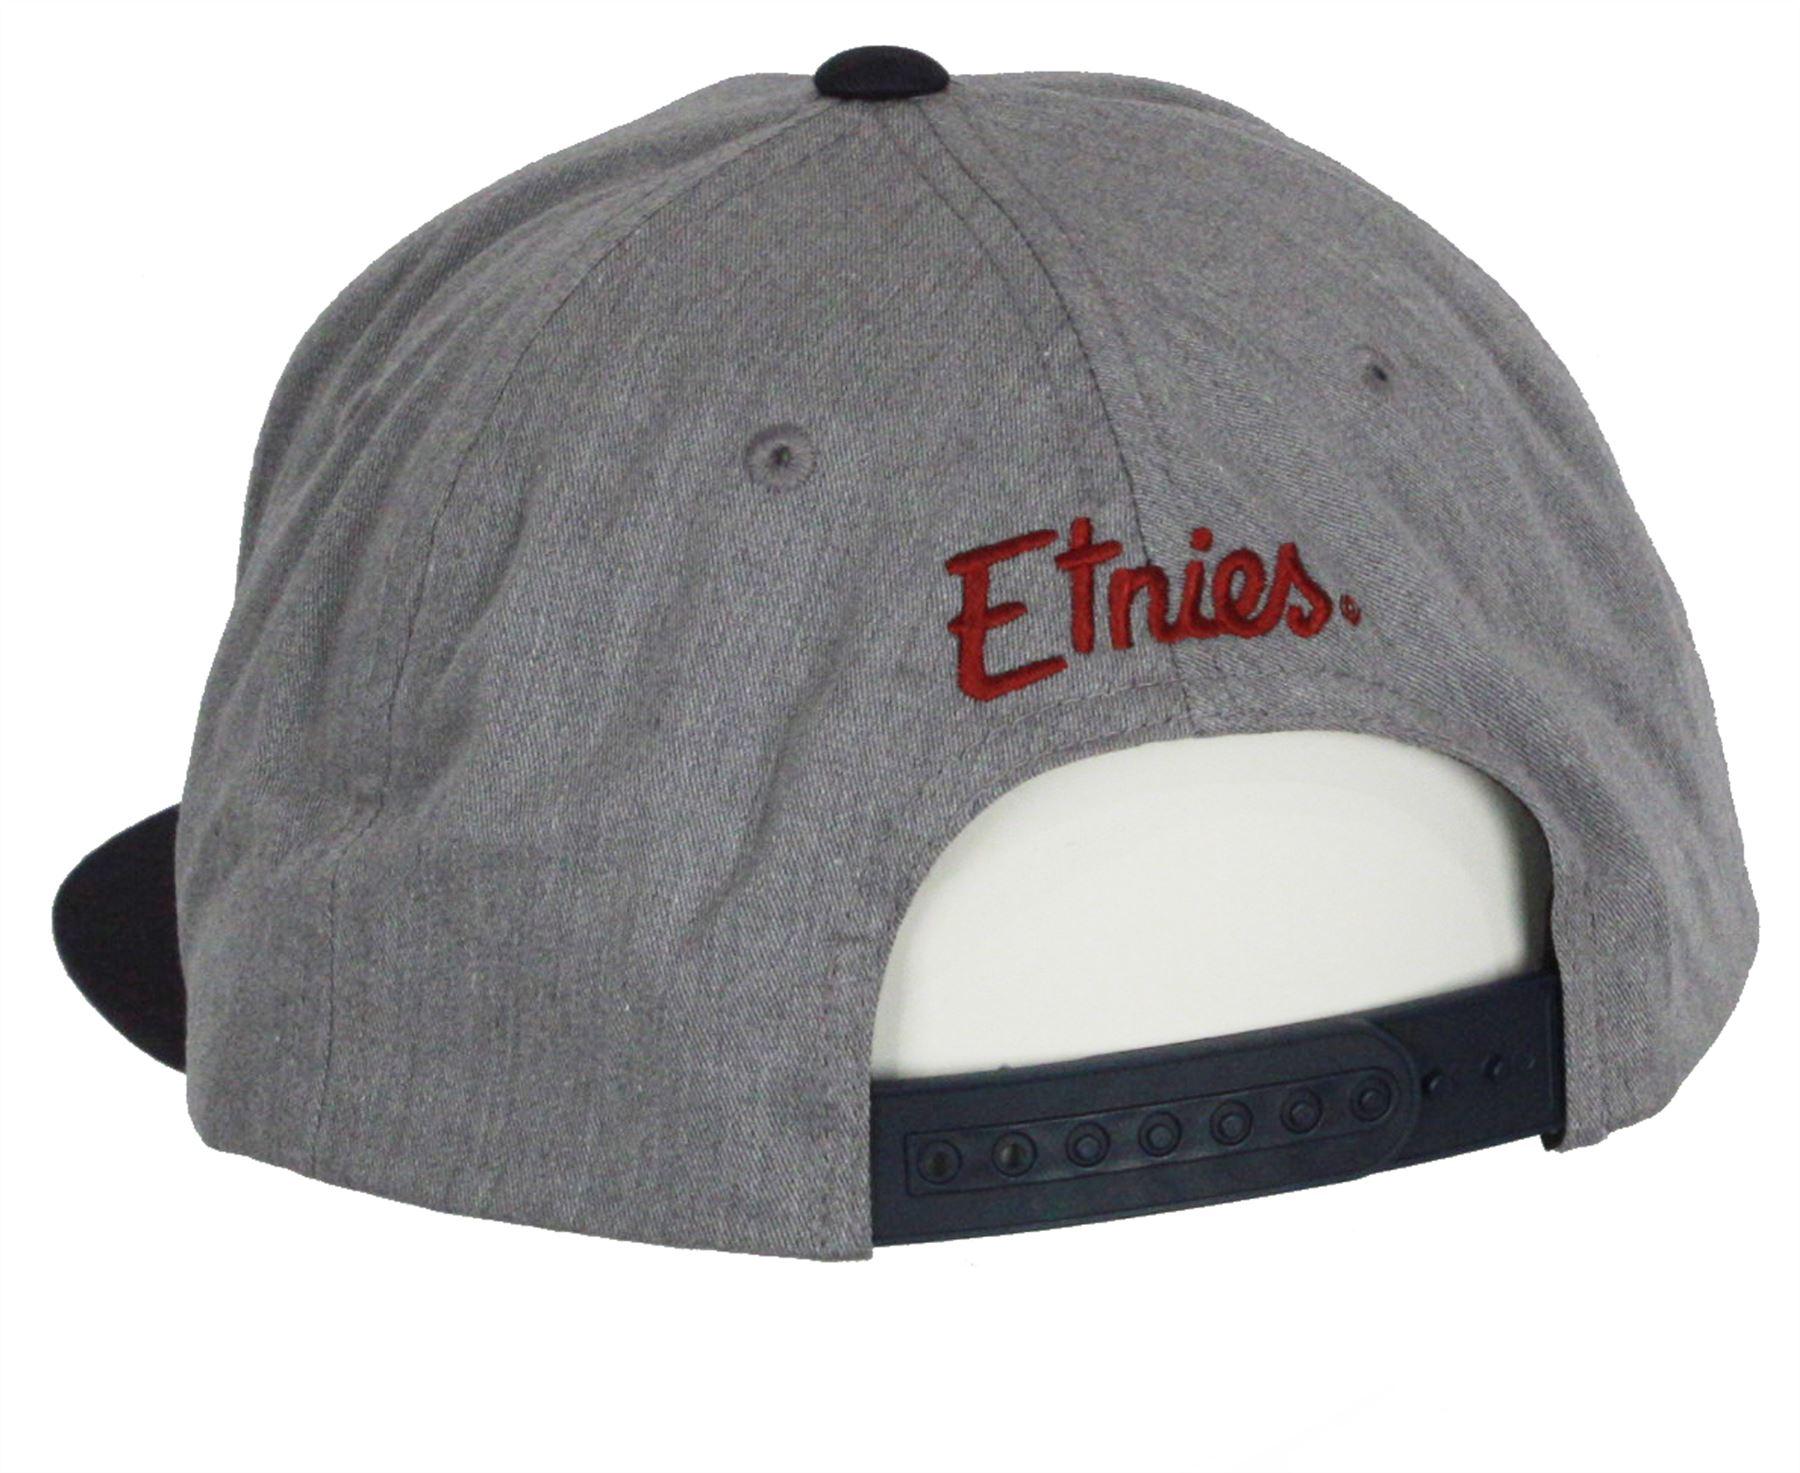 Logo Etnies ricamato in 3D sul davanti. Logo con nome Etnies ricamato sul  retro. Chiusura posteriore regolabile. 6 pannelli. de6907264ee6